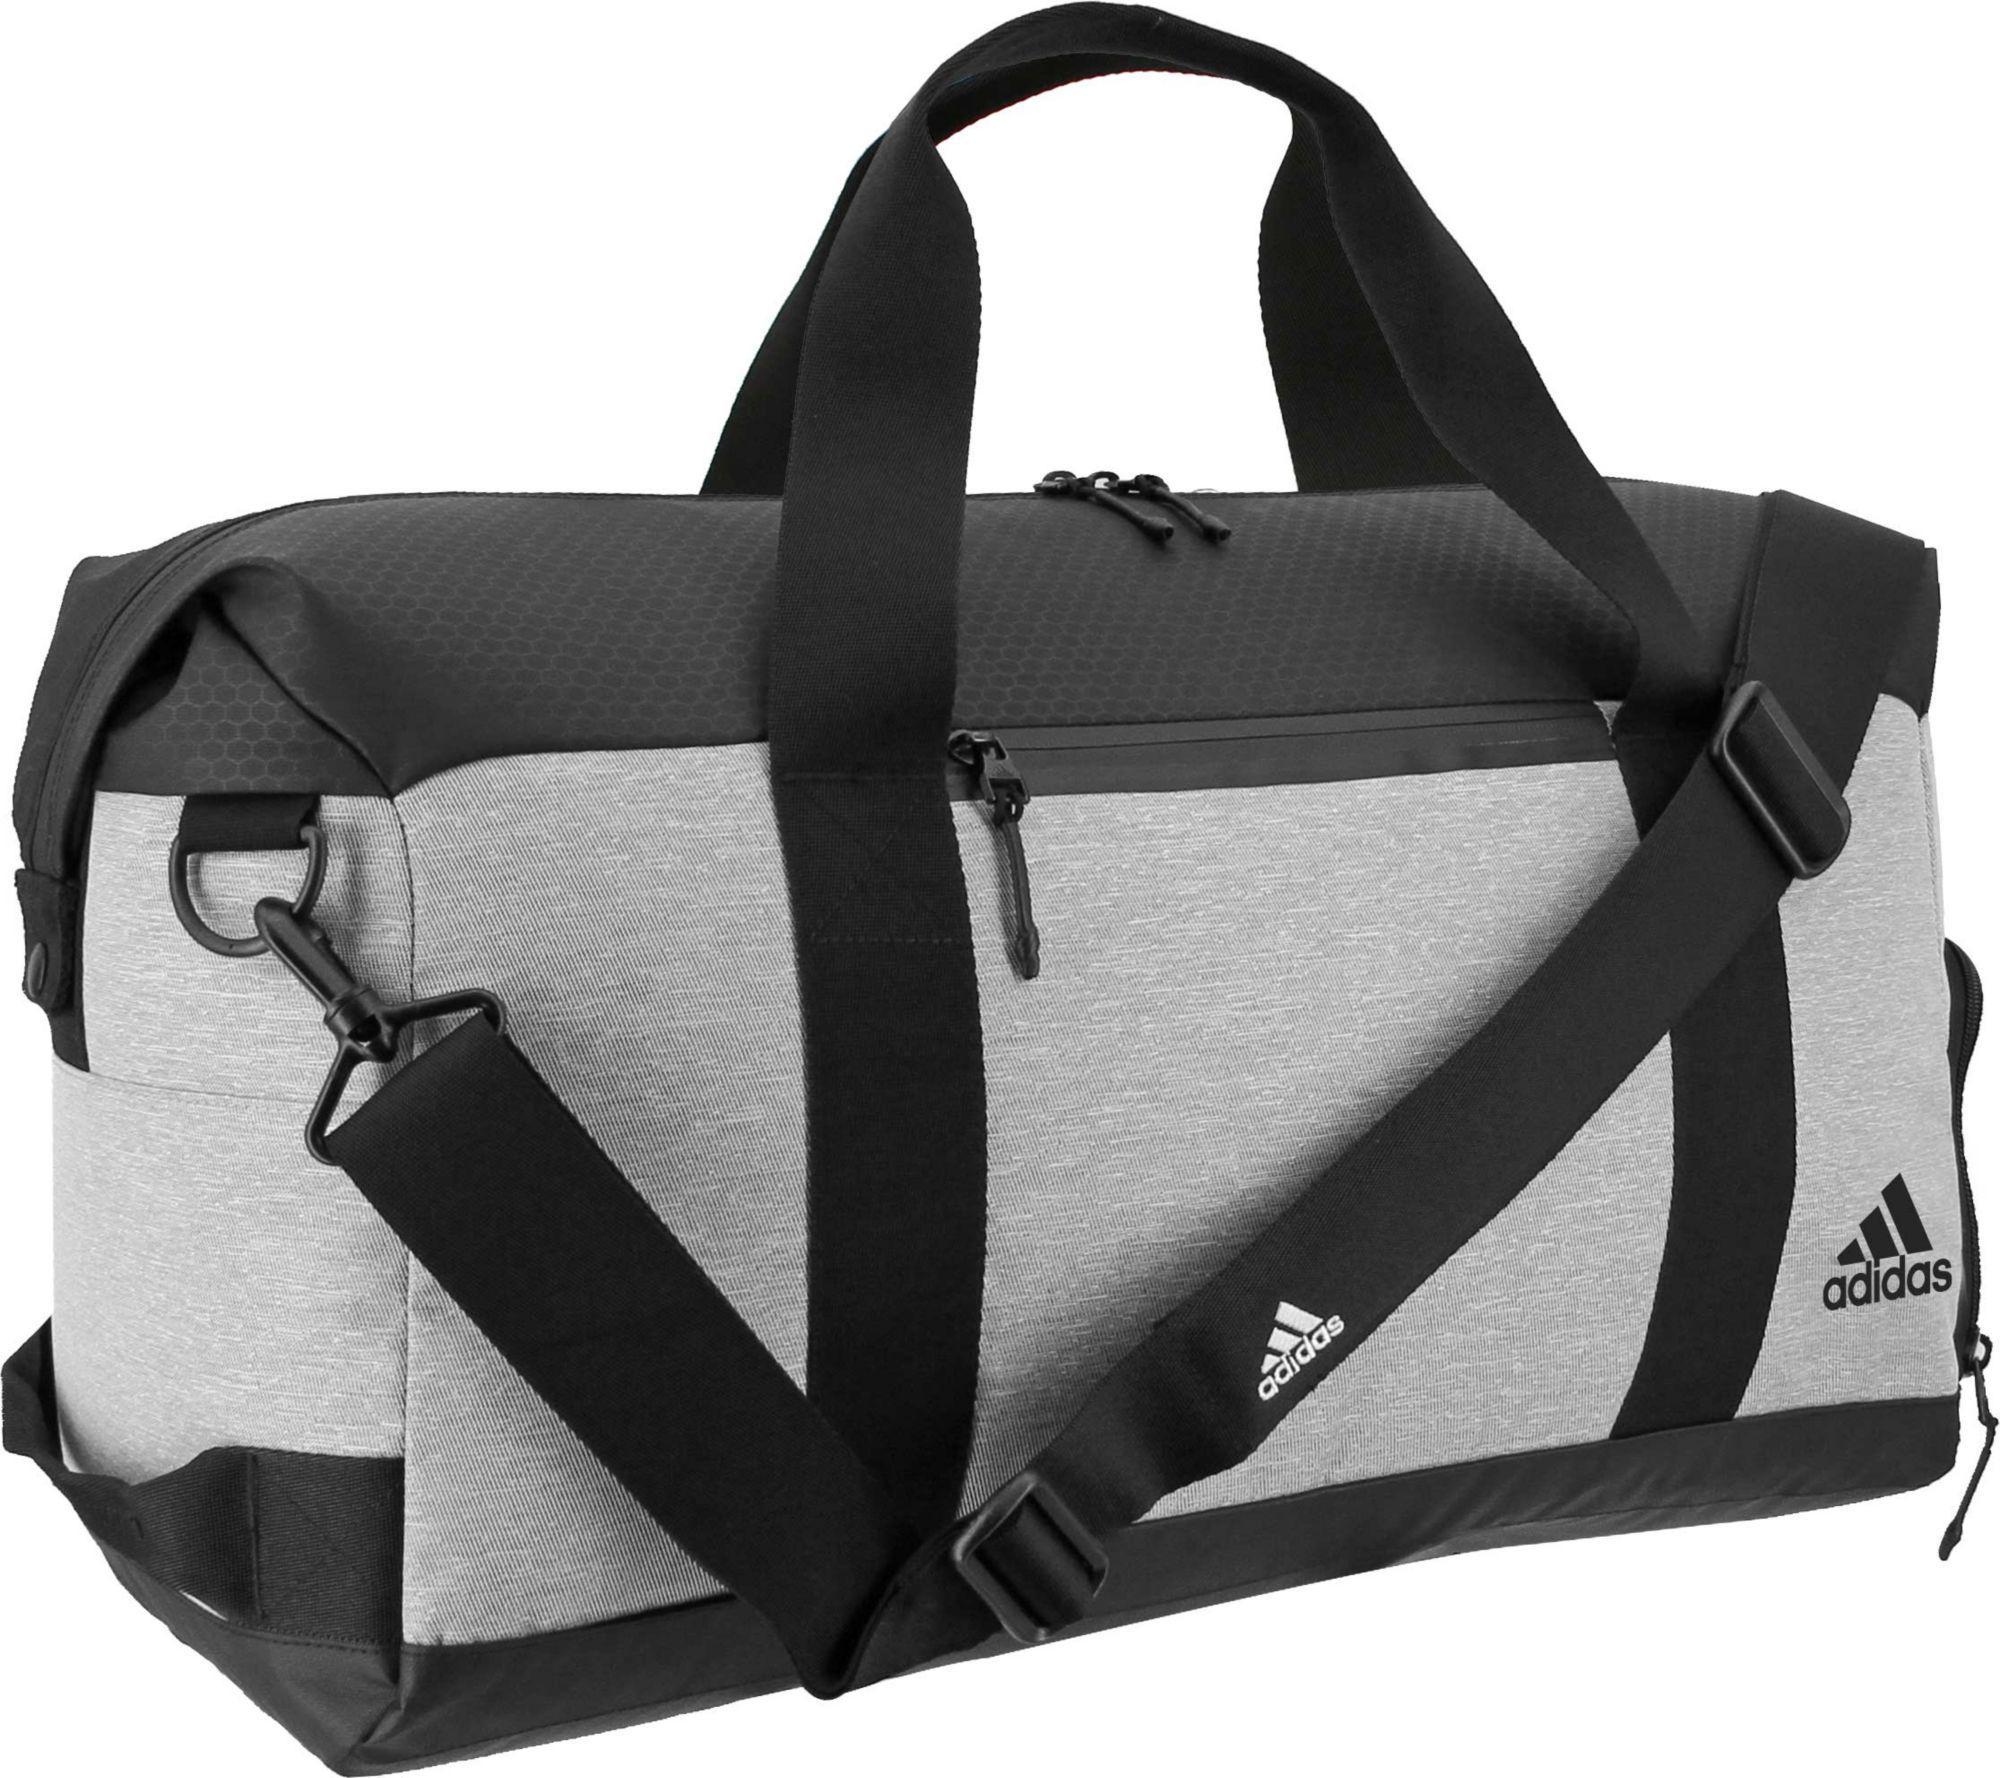 78c432254 Lyst - Adidas Sport Id Duffle Bag in Black for Men